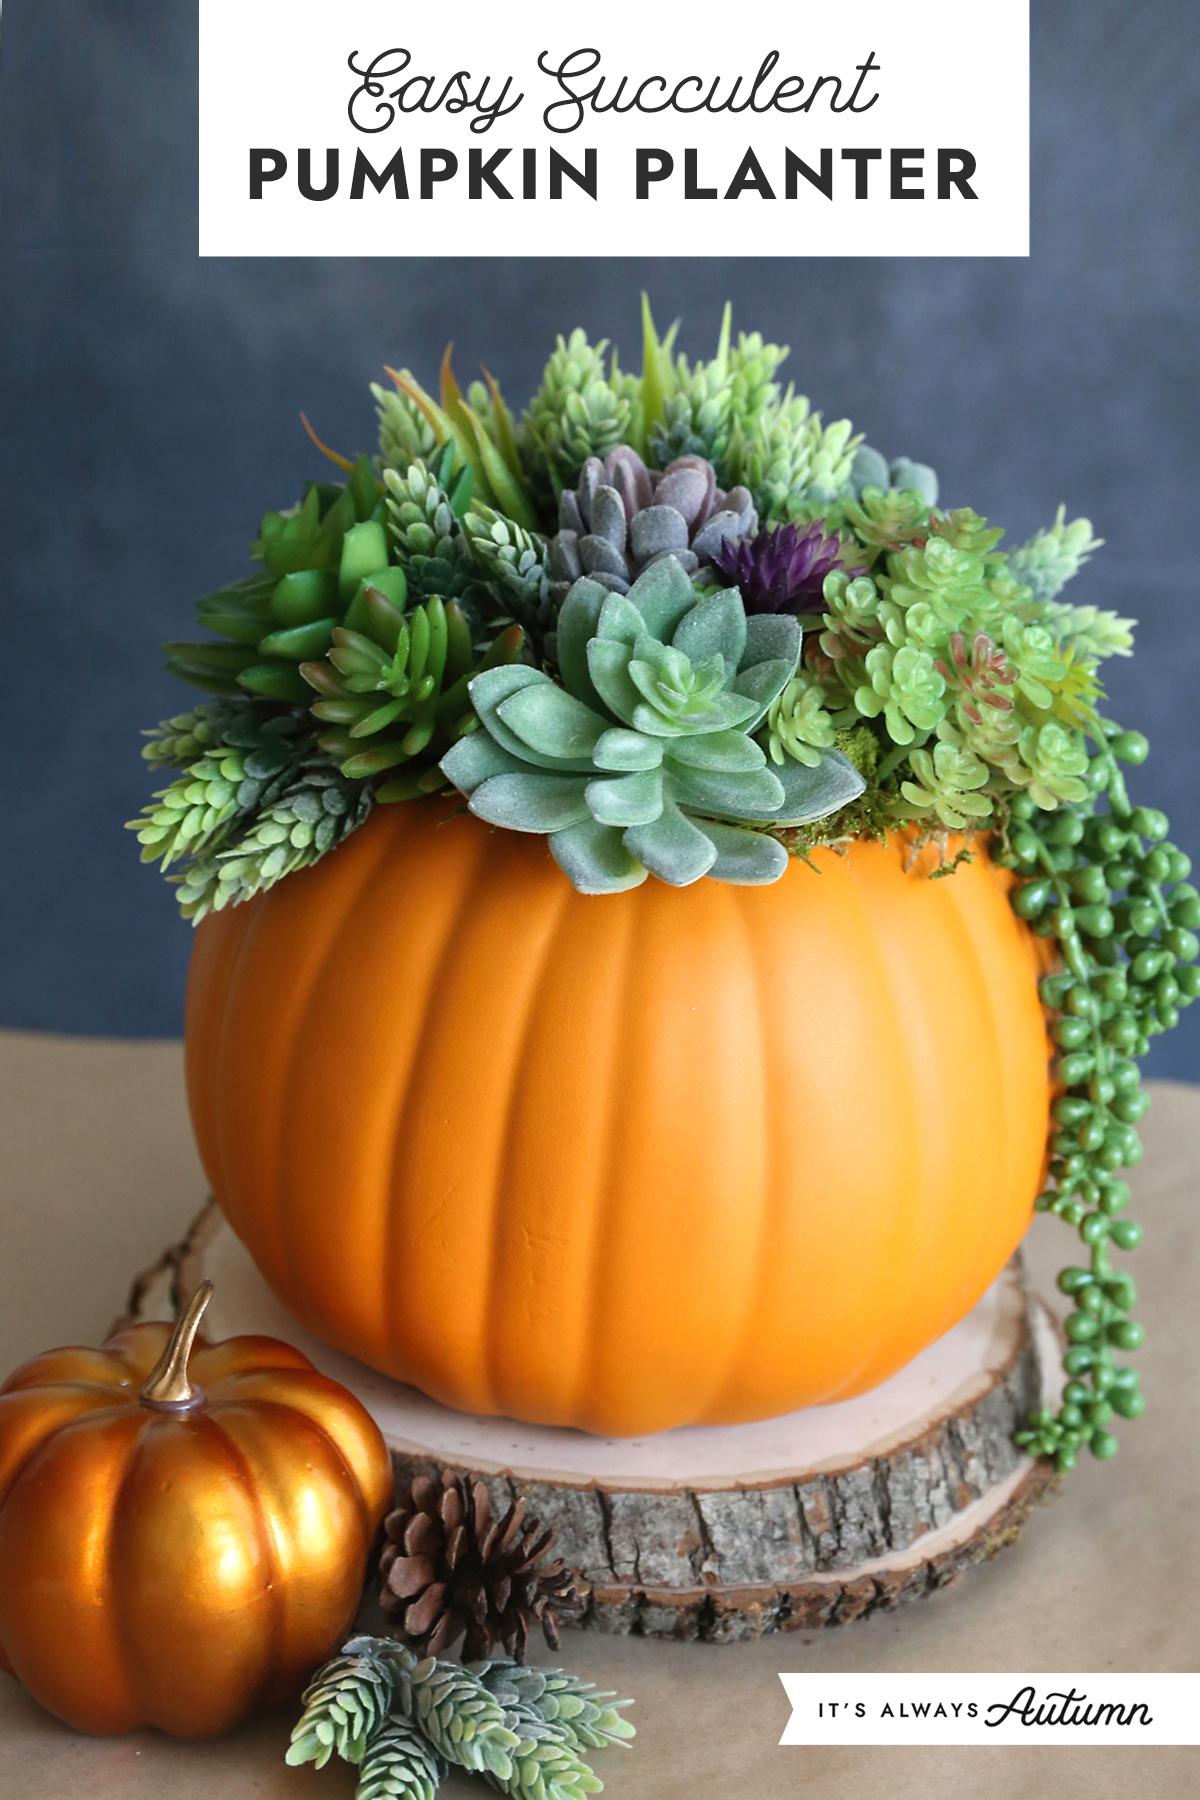 "Easy Succulent Pumpkin Planter: faux pumpkin with faux succulents ""planted"" in it"